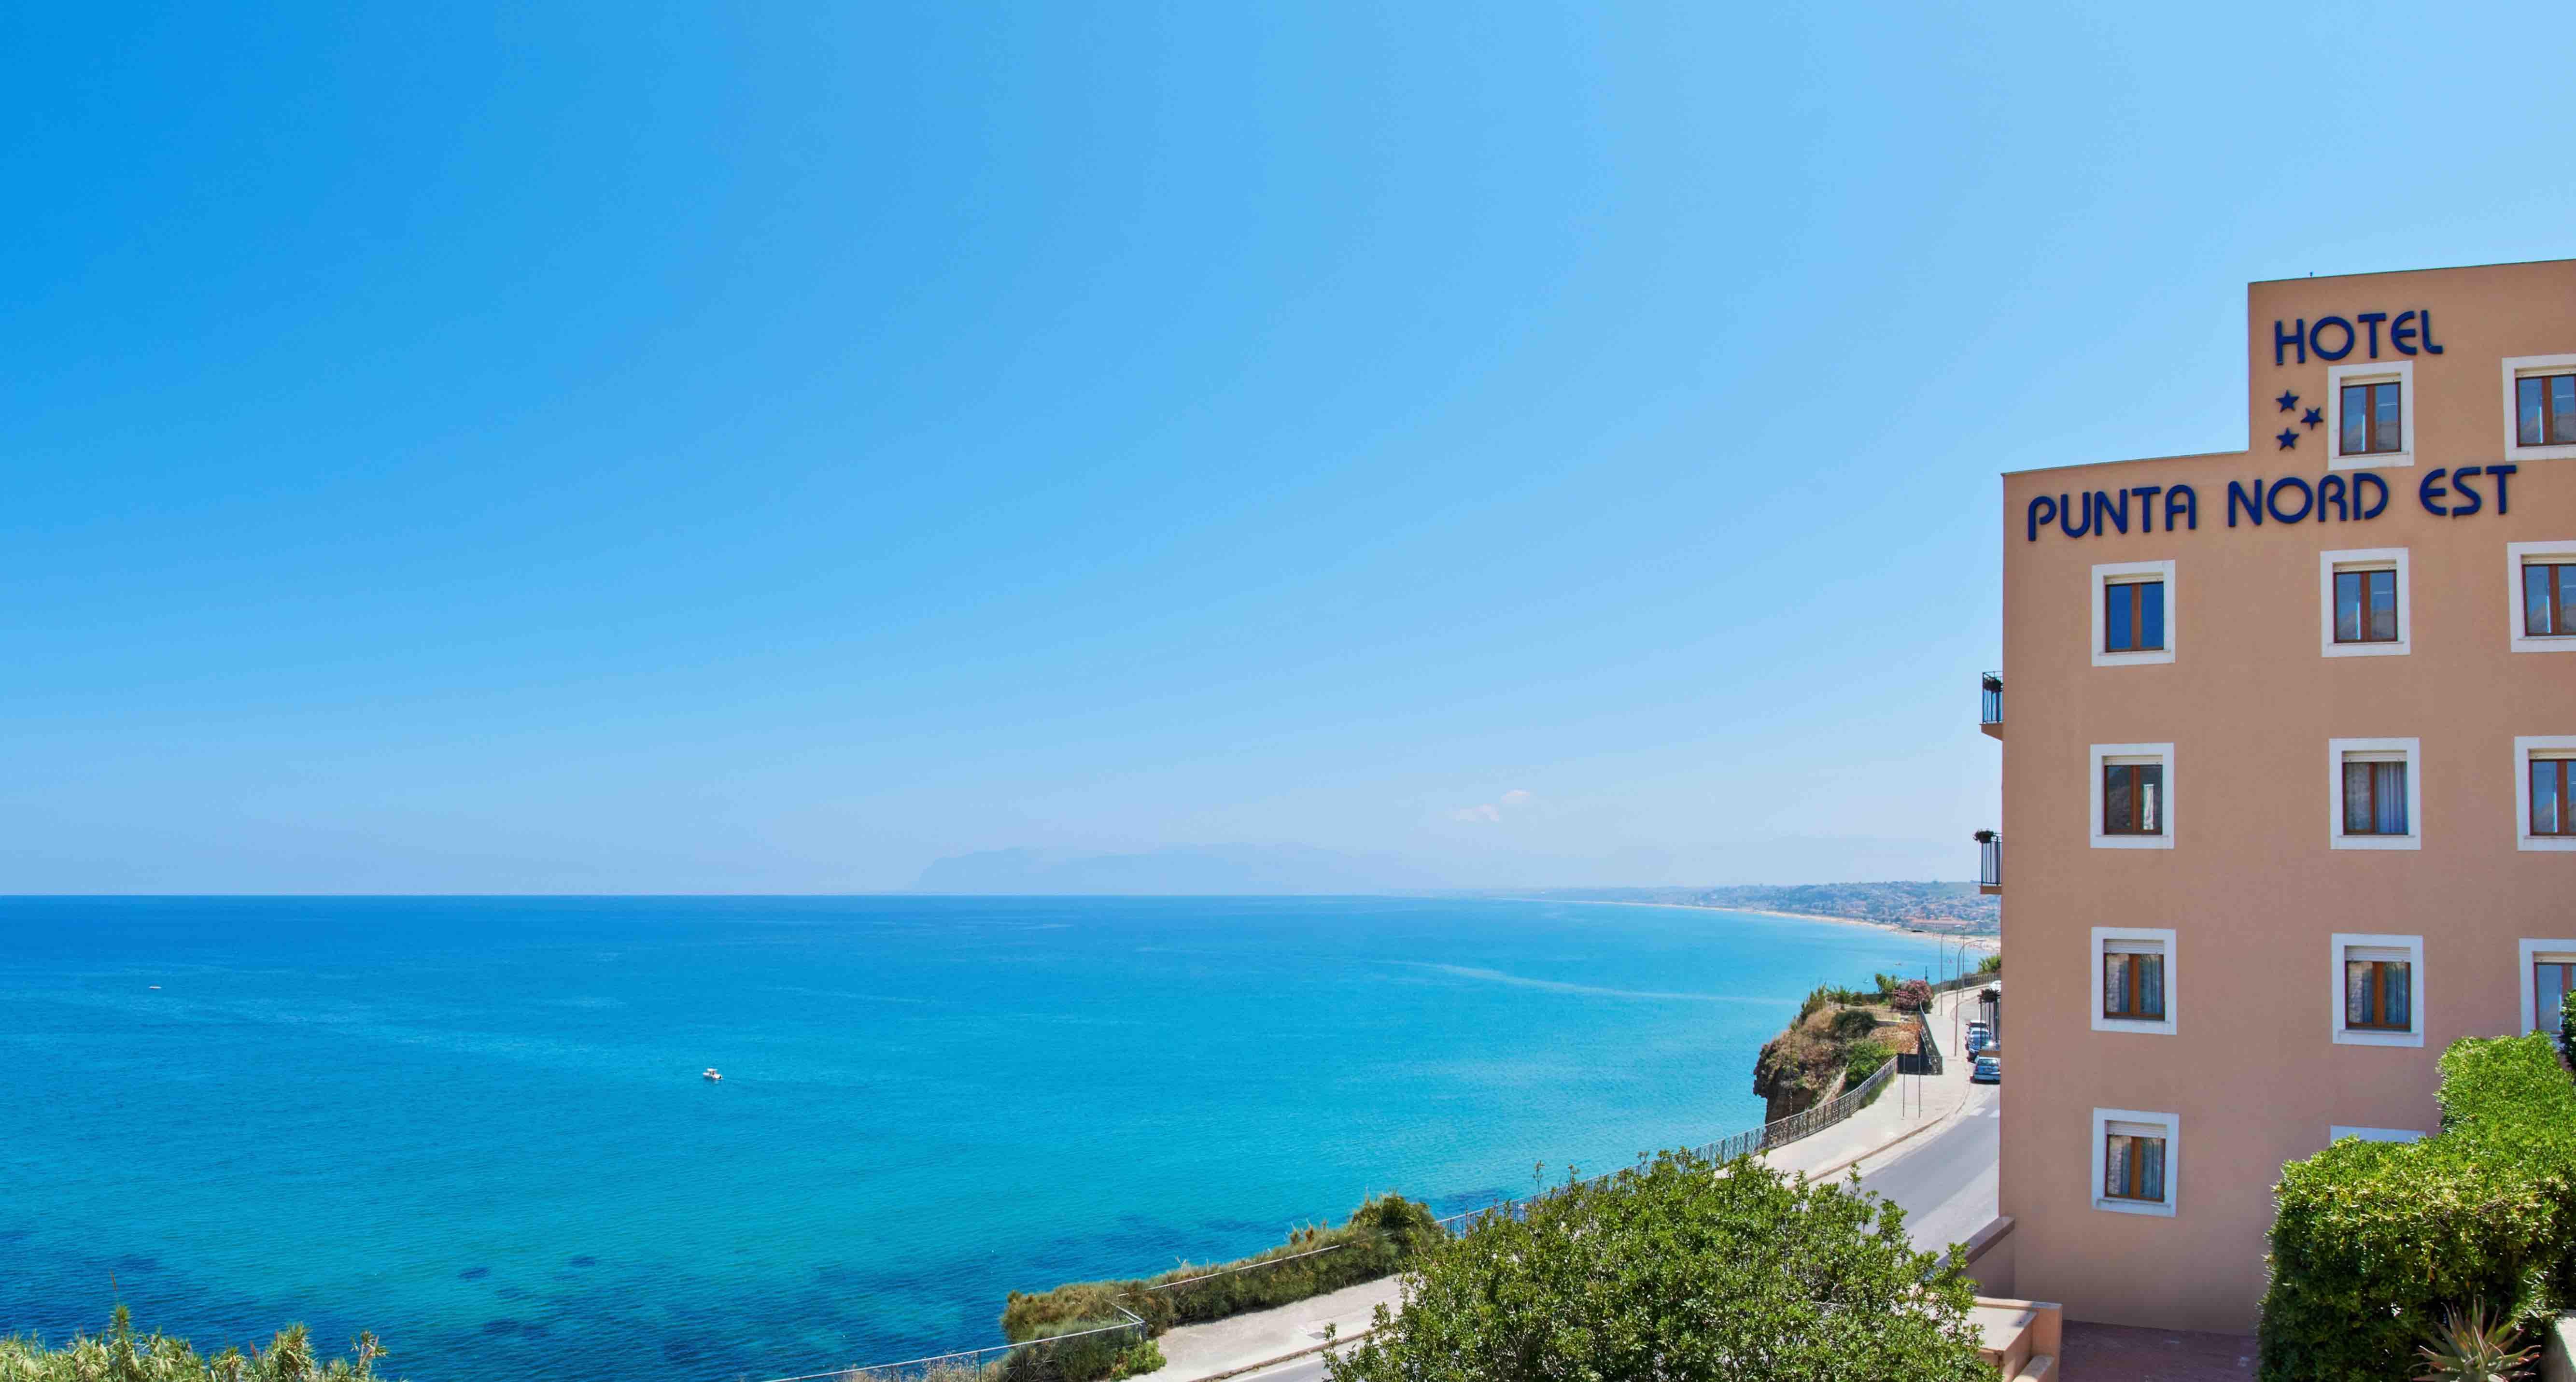 Punta Nord Est Hotel – Castellammare del Golfo